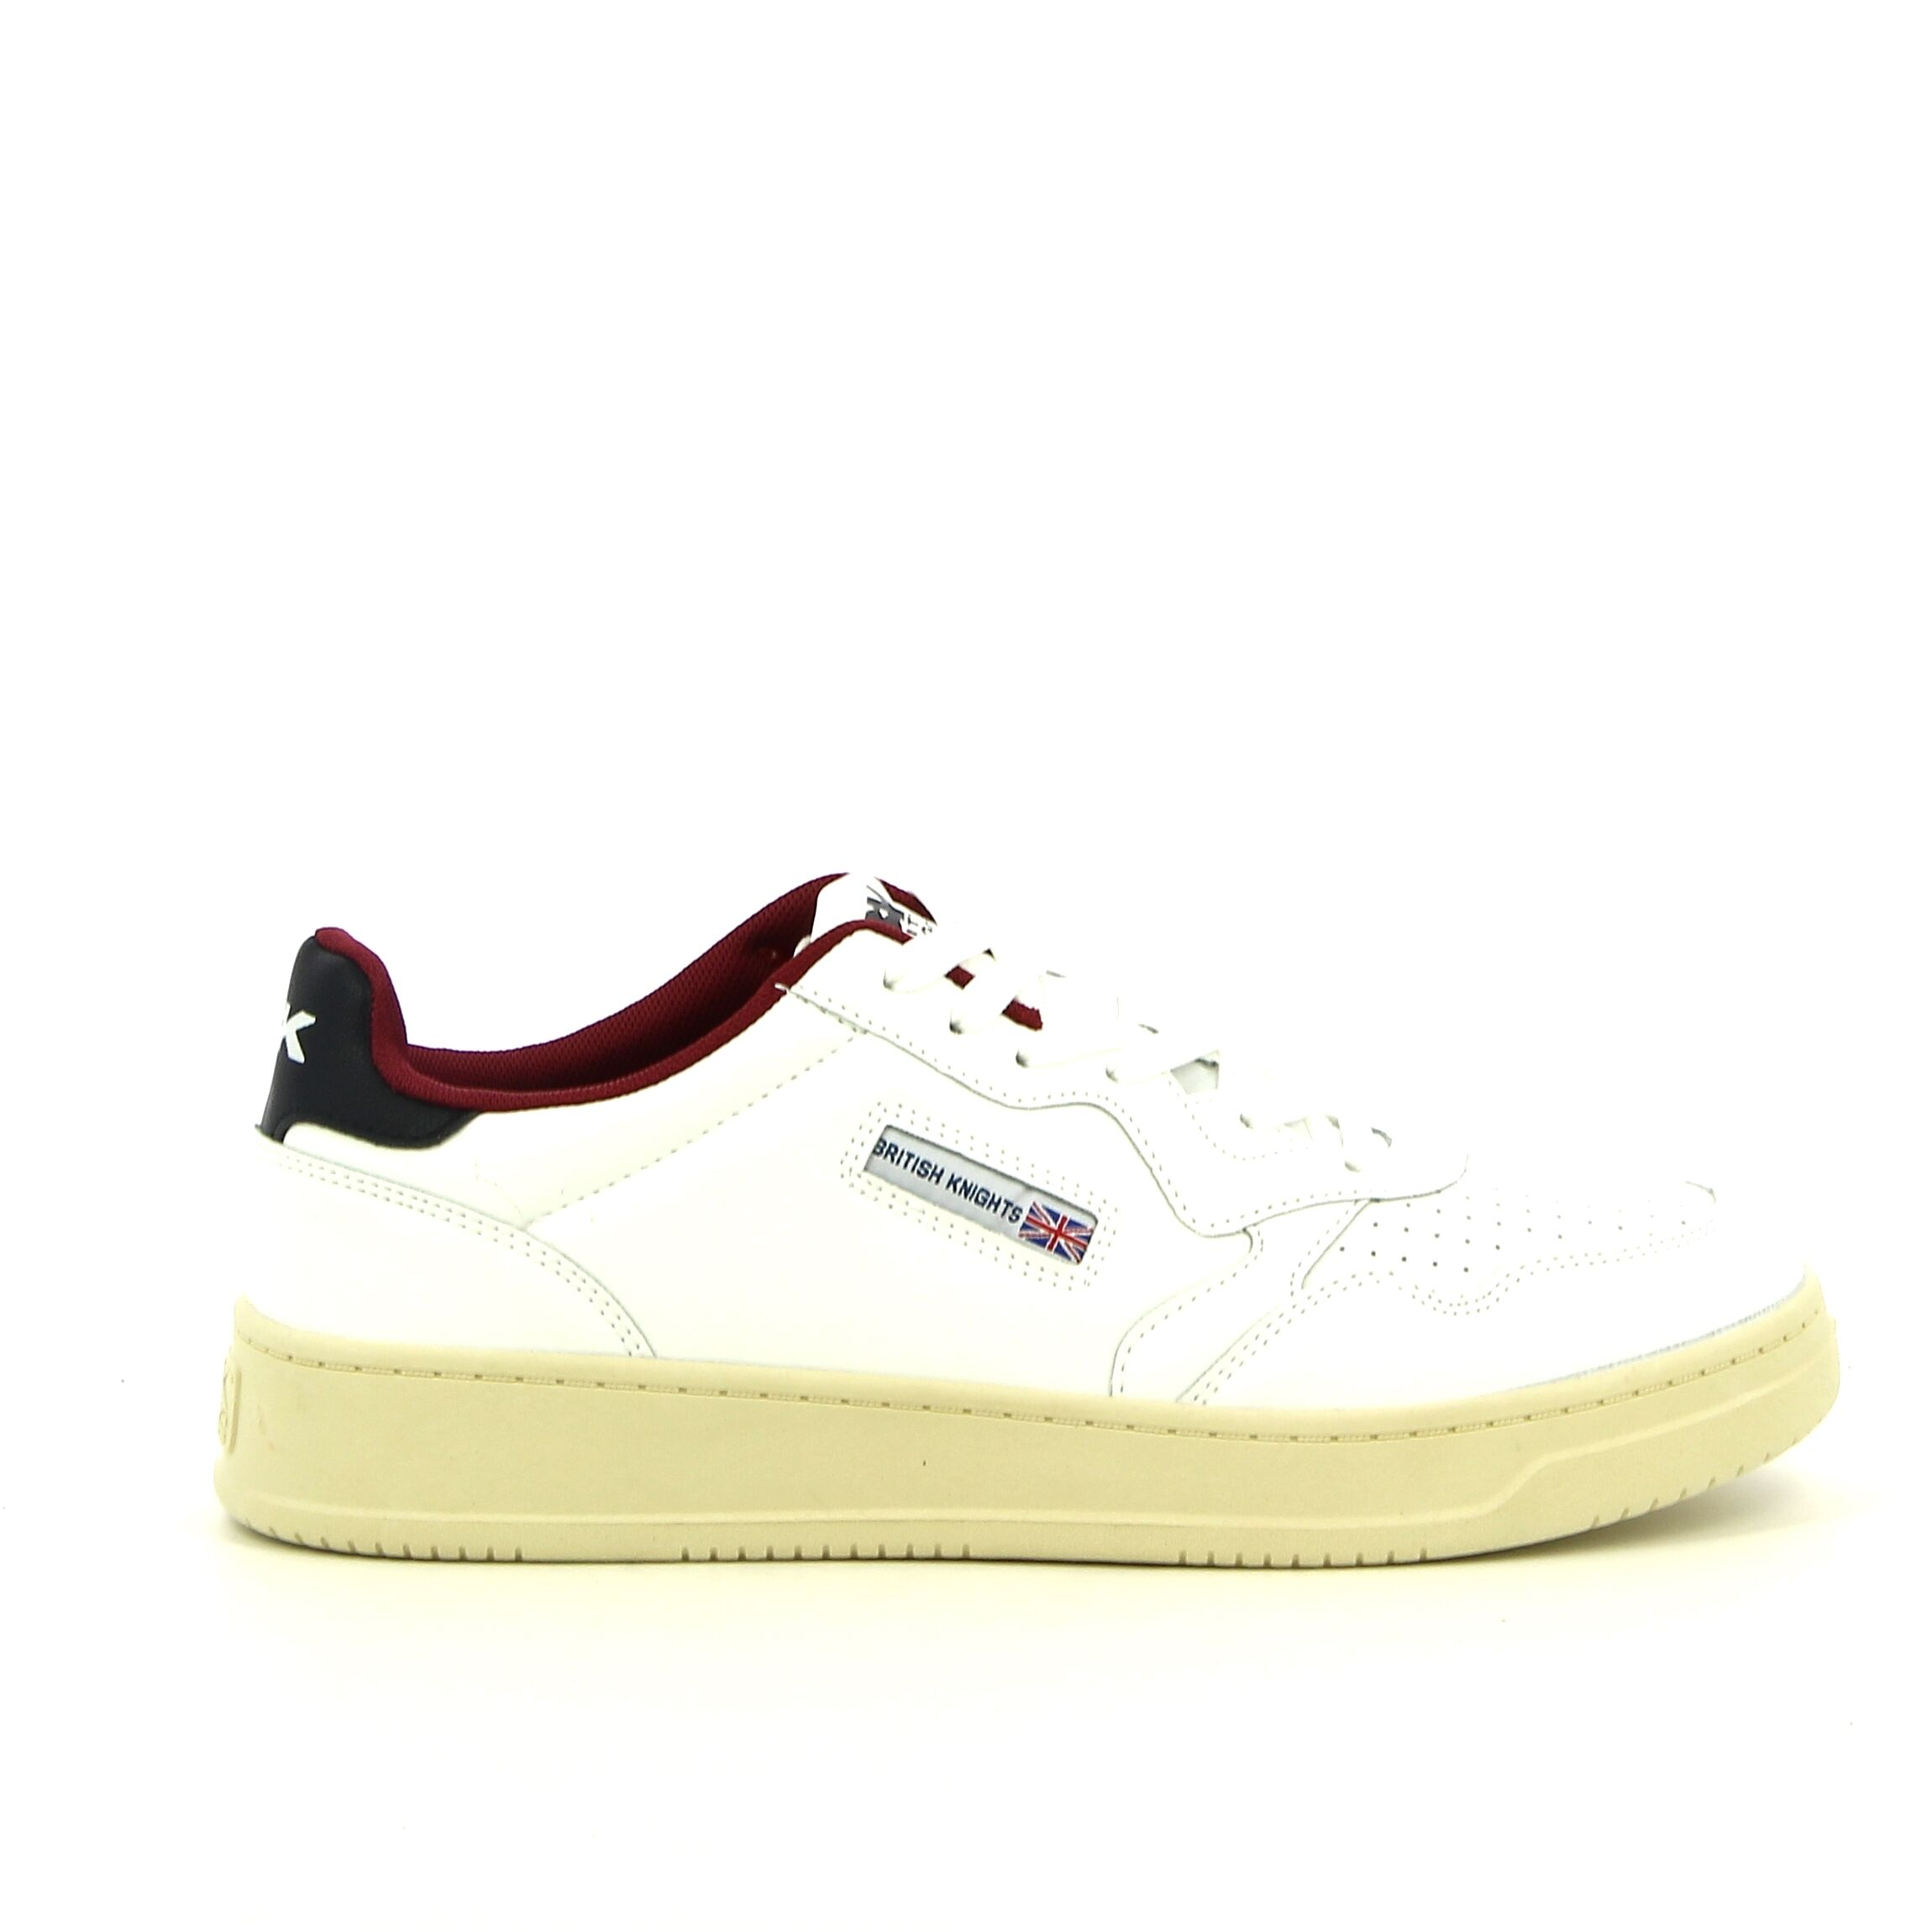 BK - Wit/Zwart - Sneakers